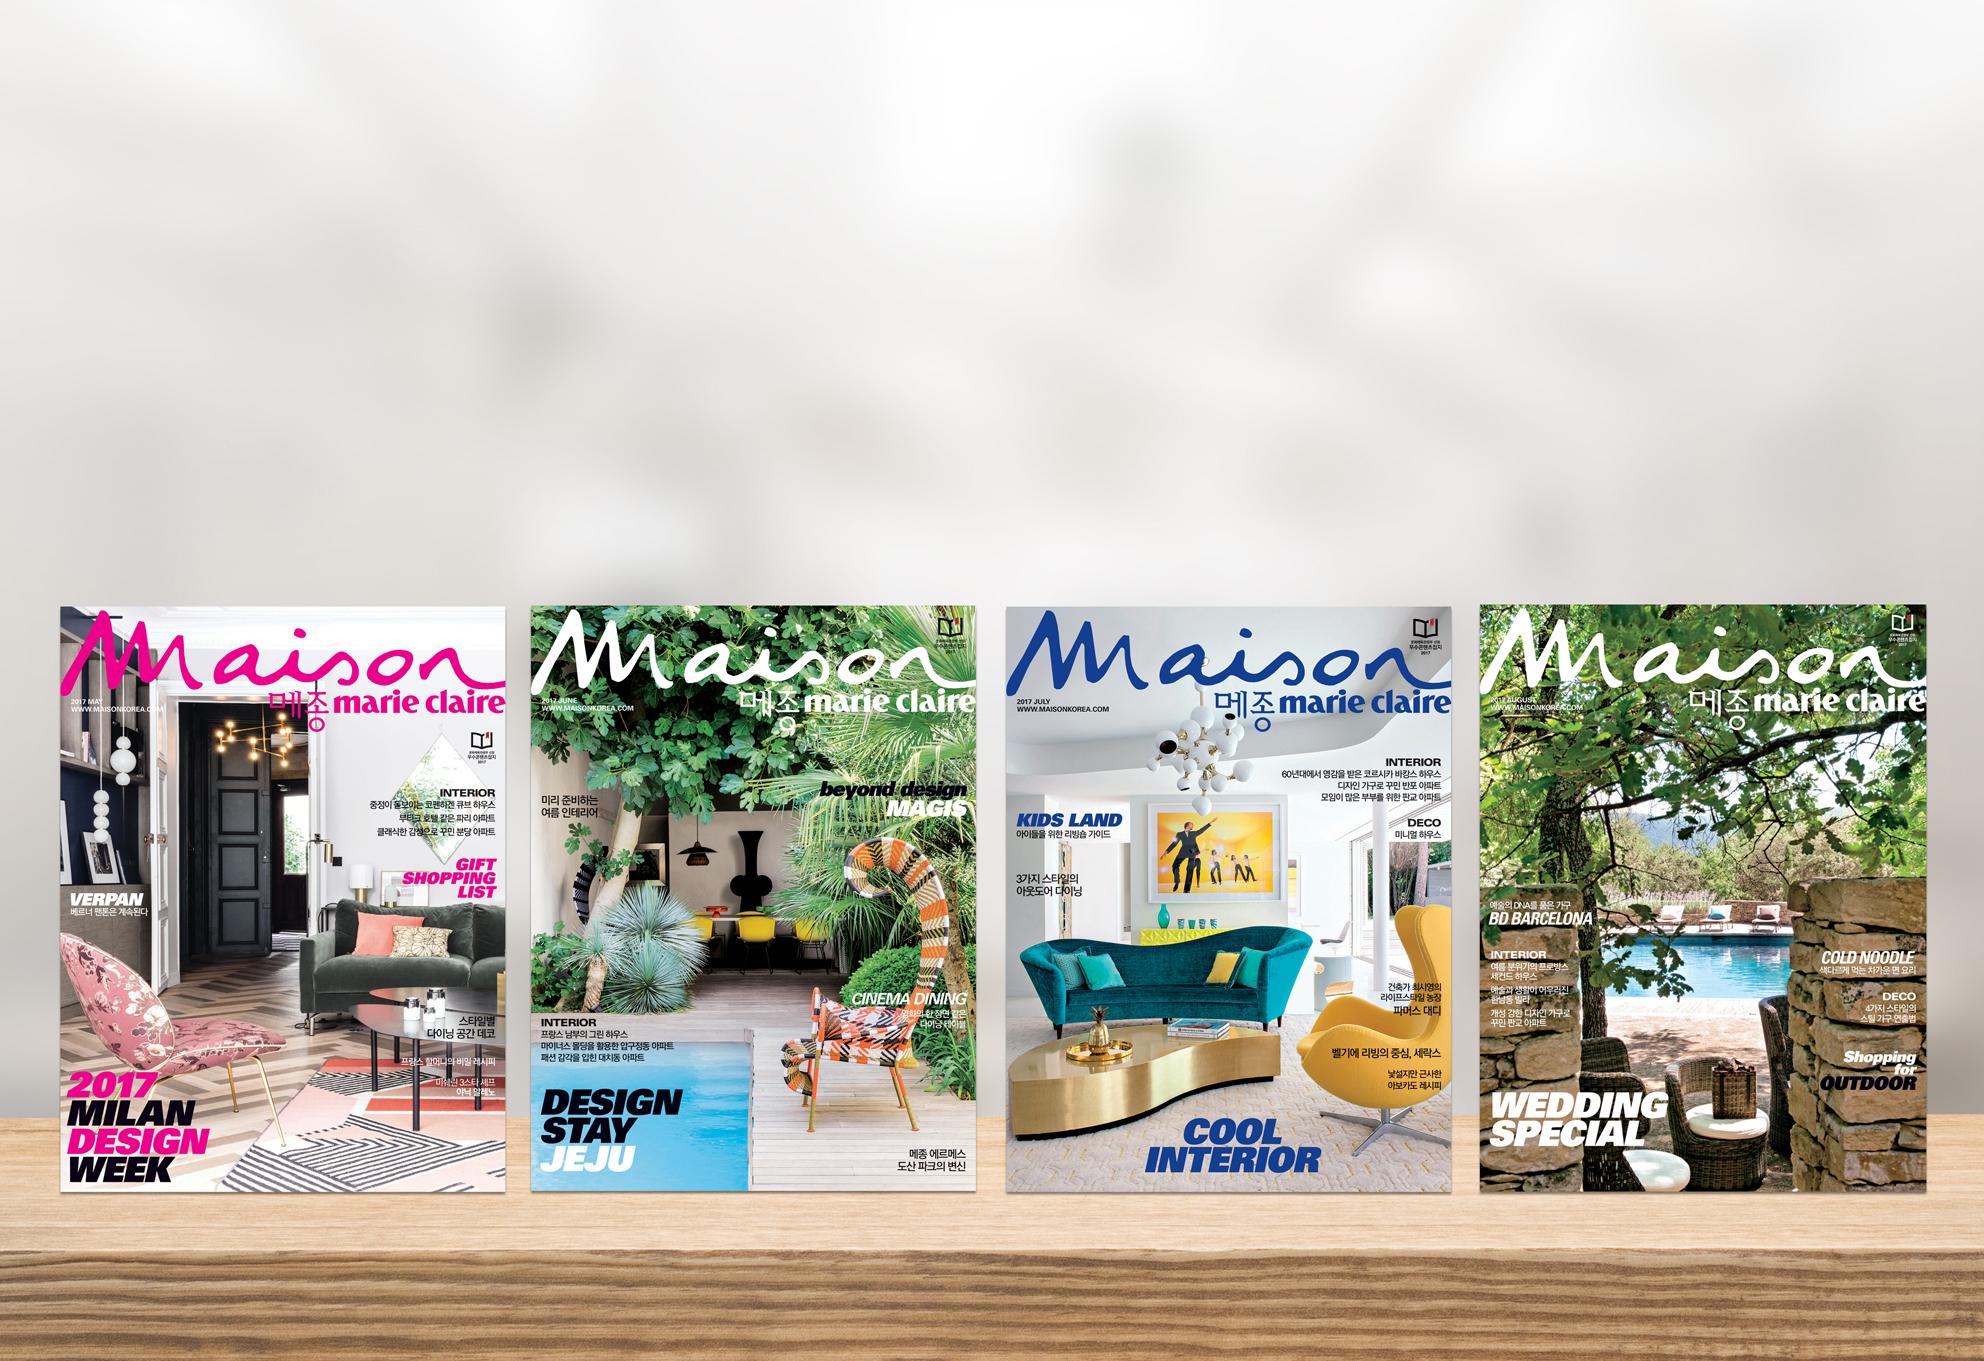 Masion 2017 05-08